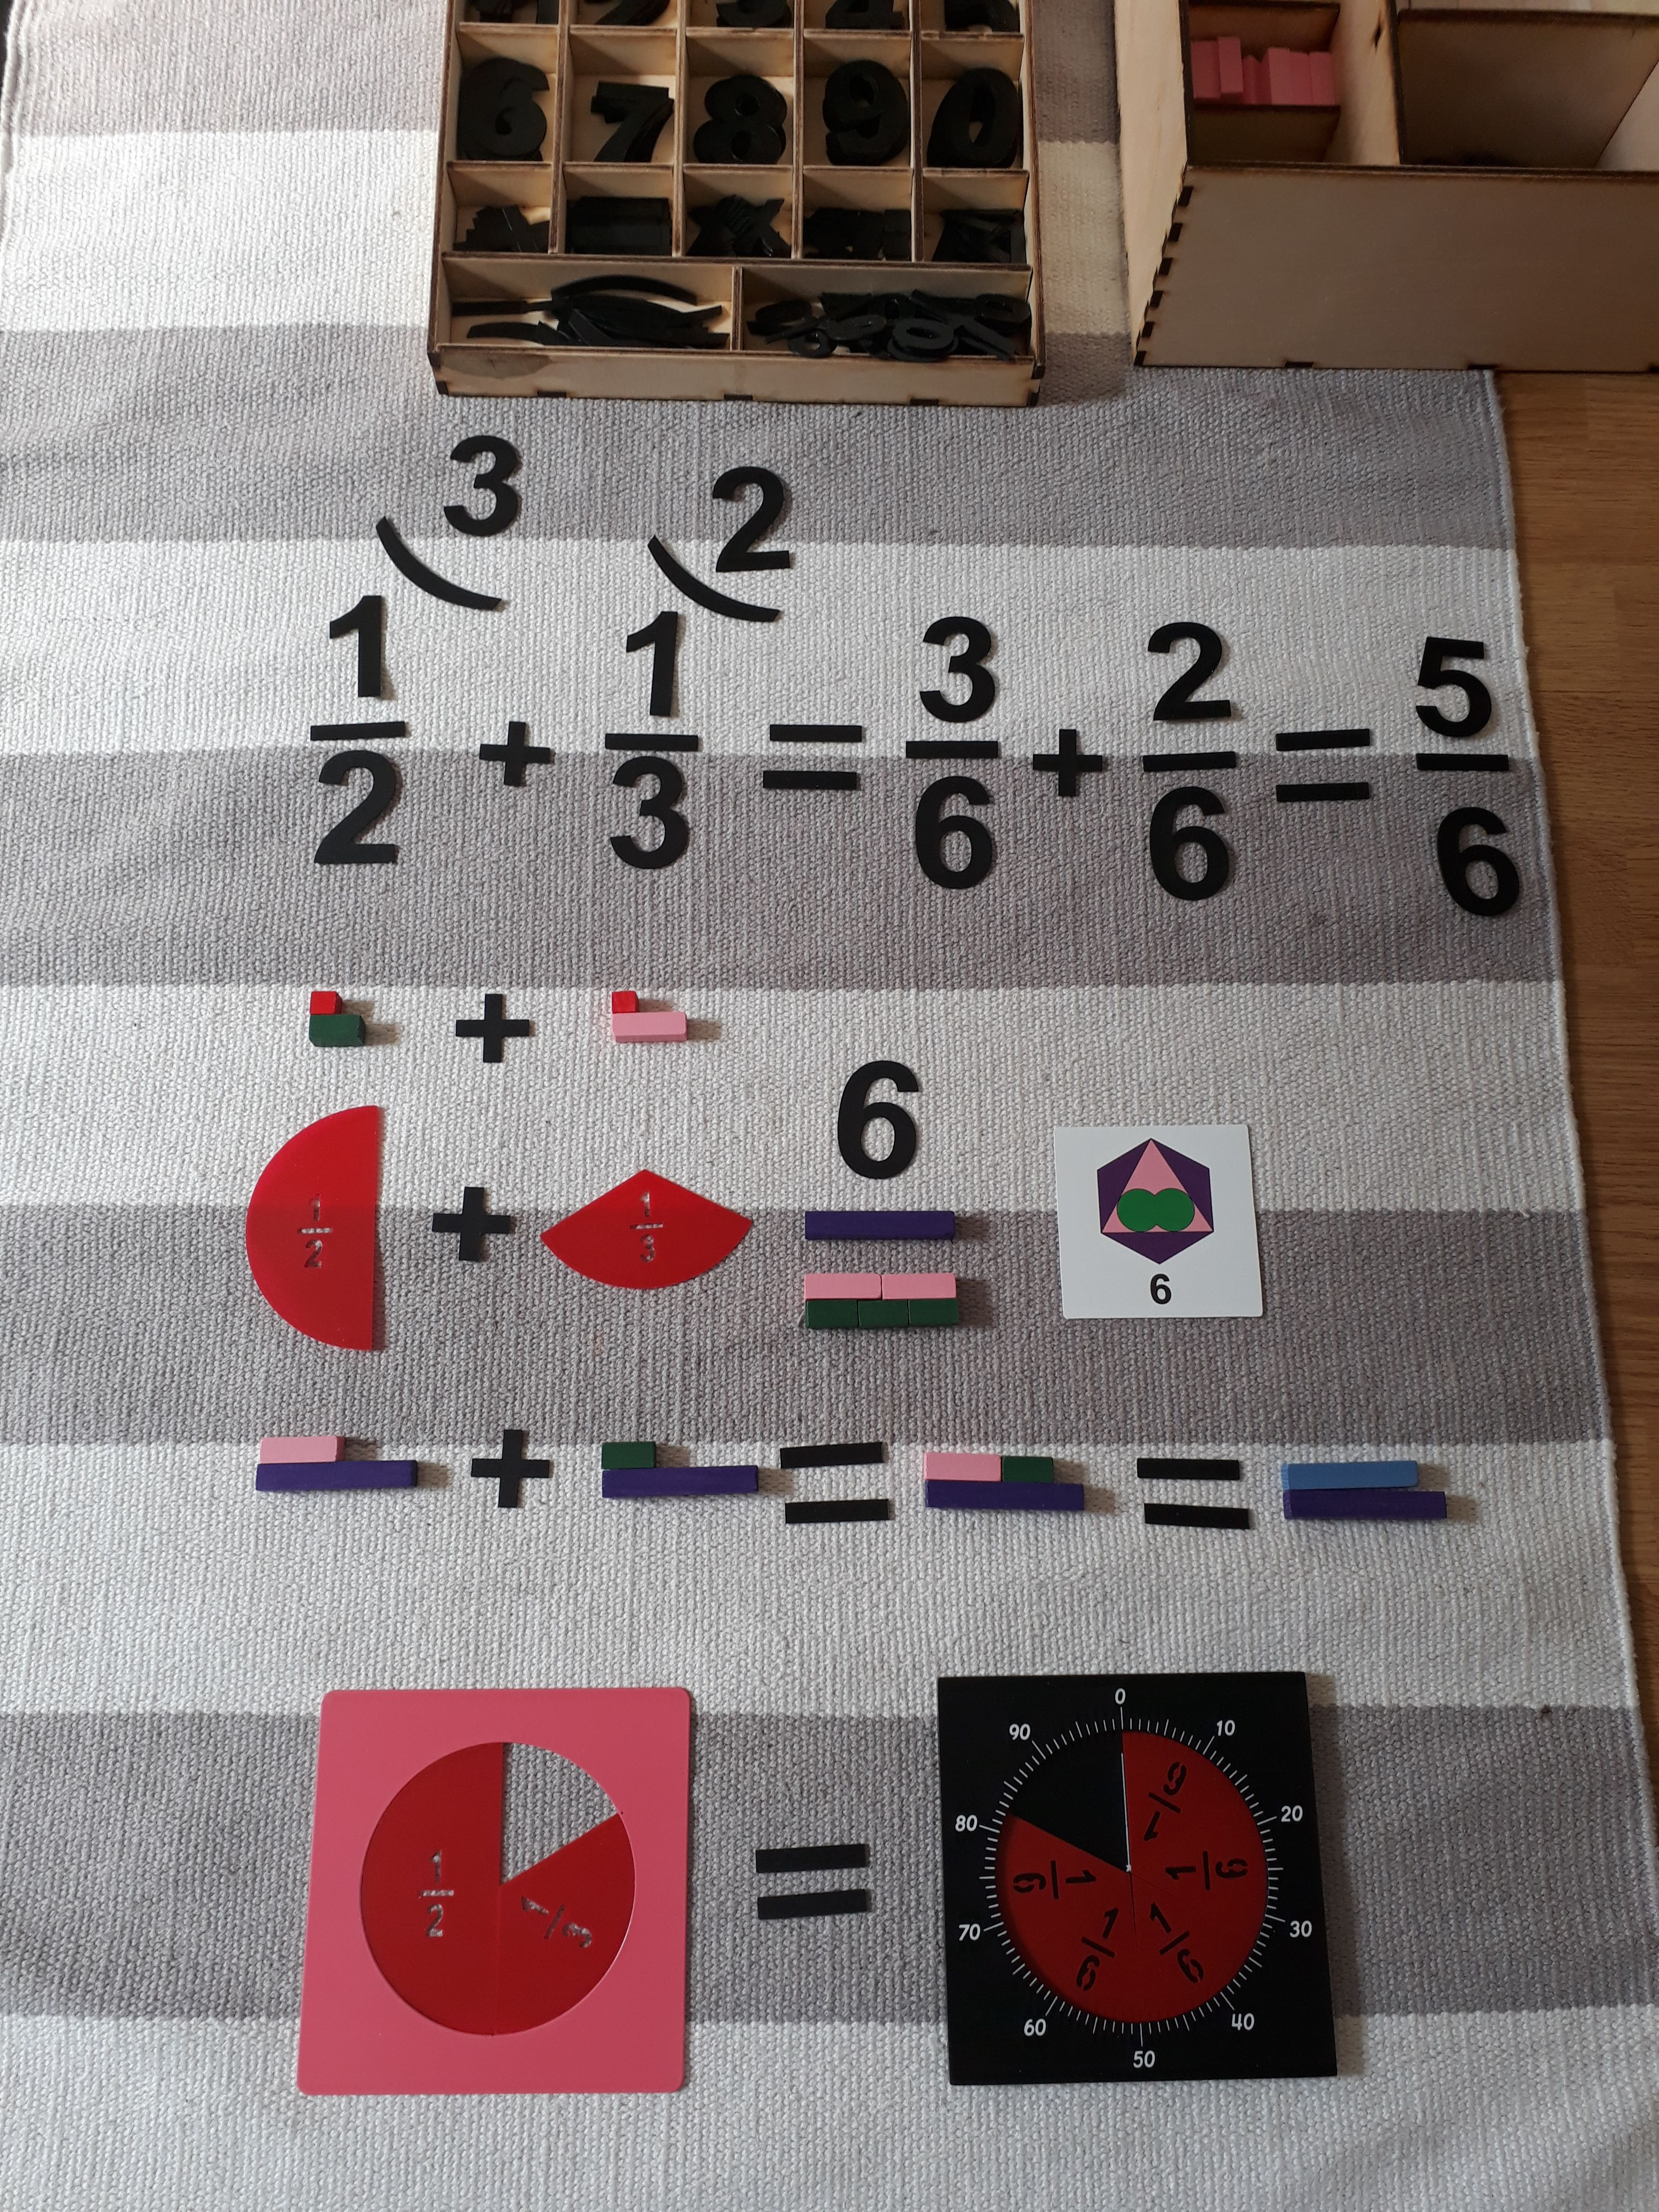 Pin By Marita Veldre On 1ntessori Math